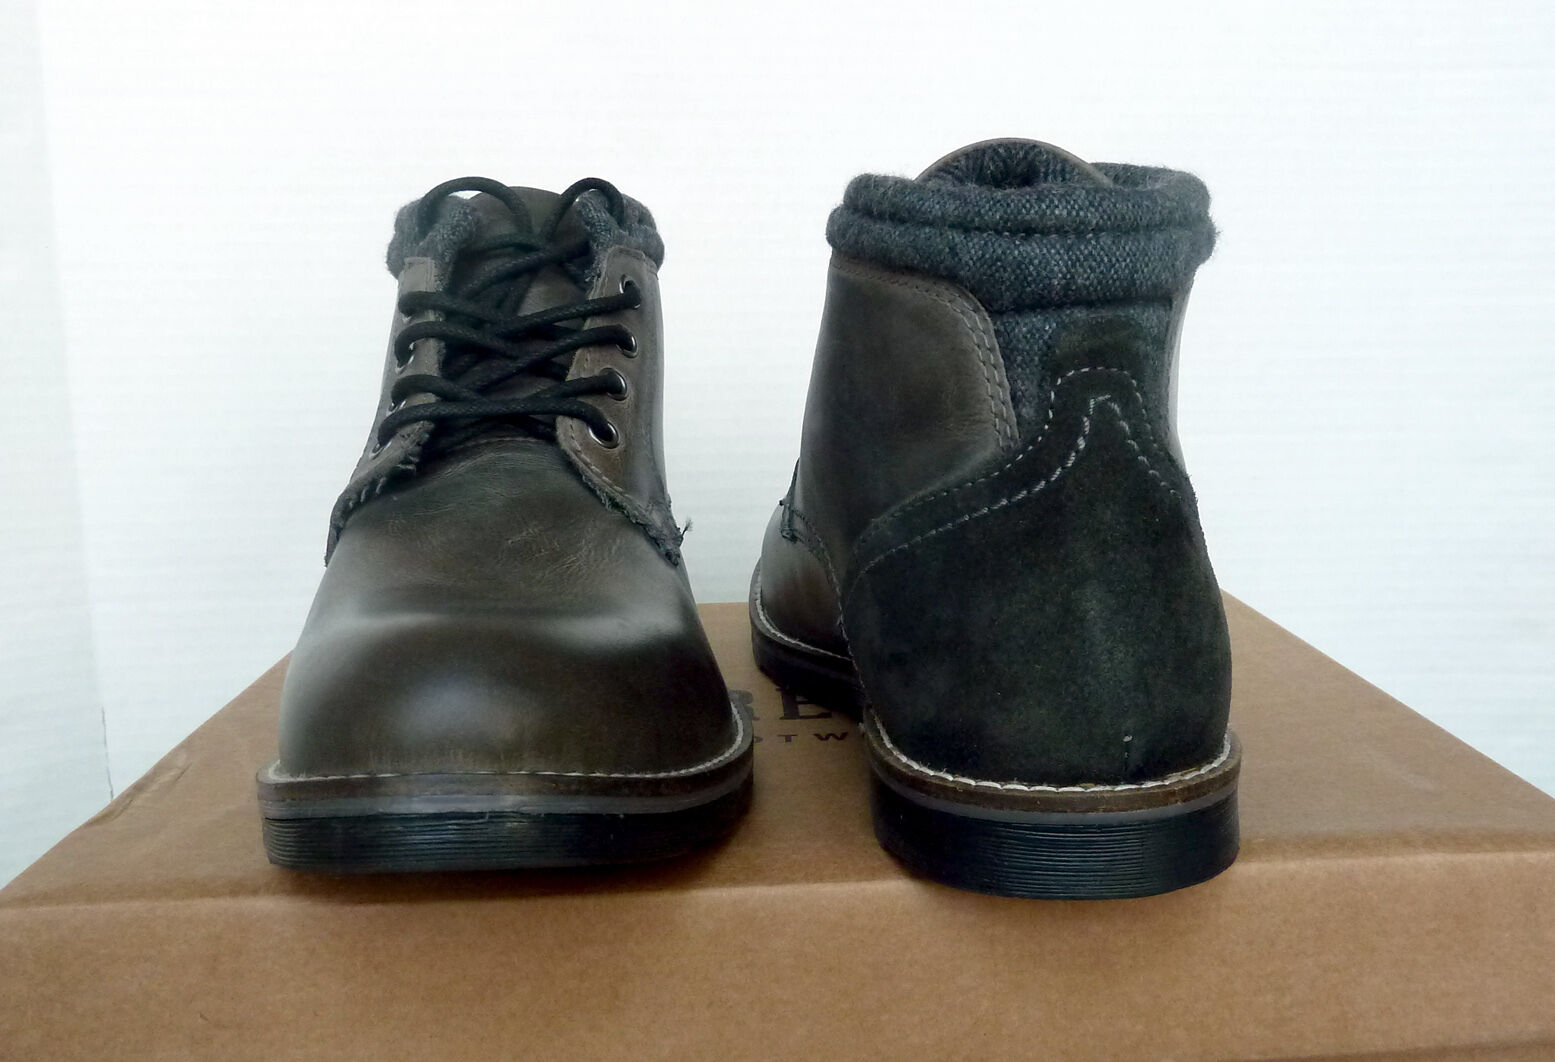 New Uomo`s Crevo Geoff Grigio Leather Boots CV1423-020 CV1423-020 Boots ed7d49